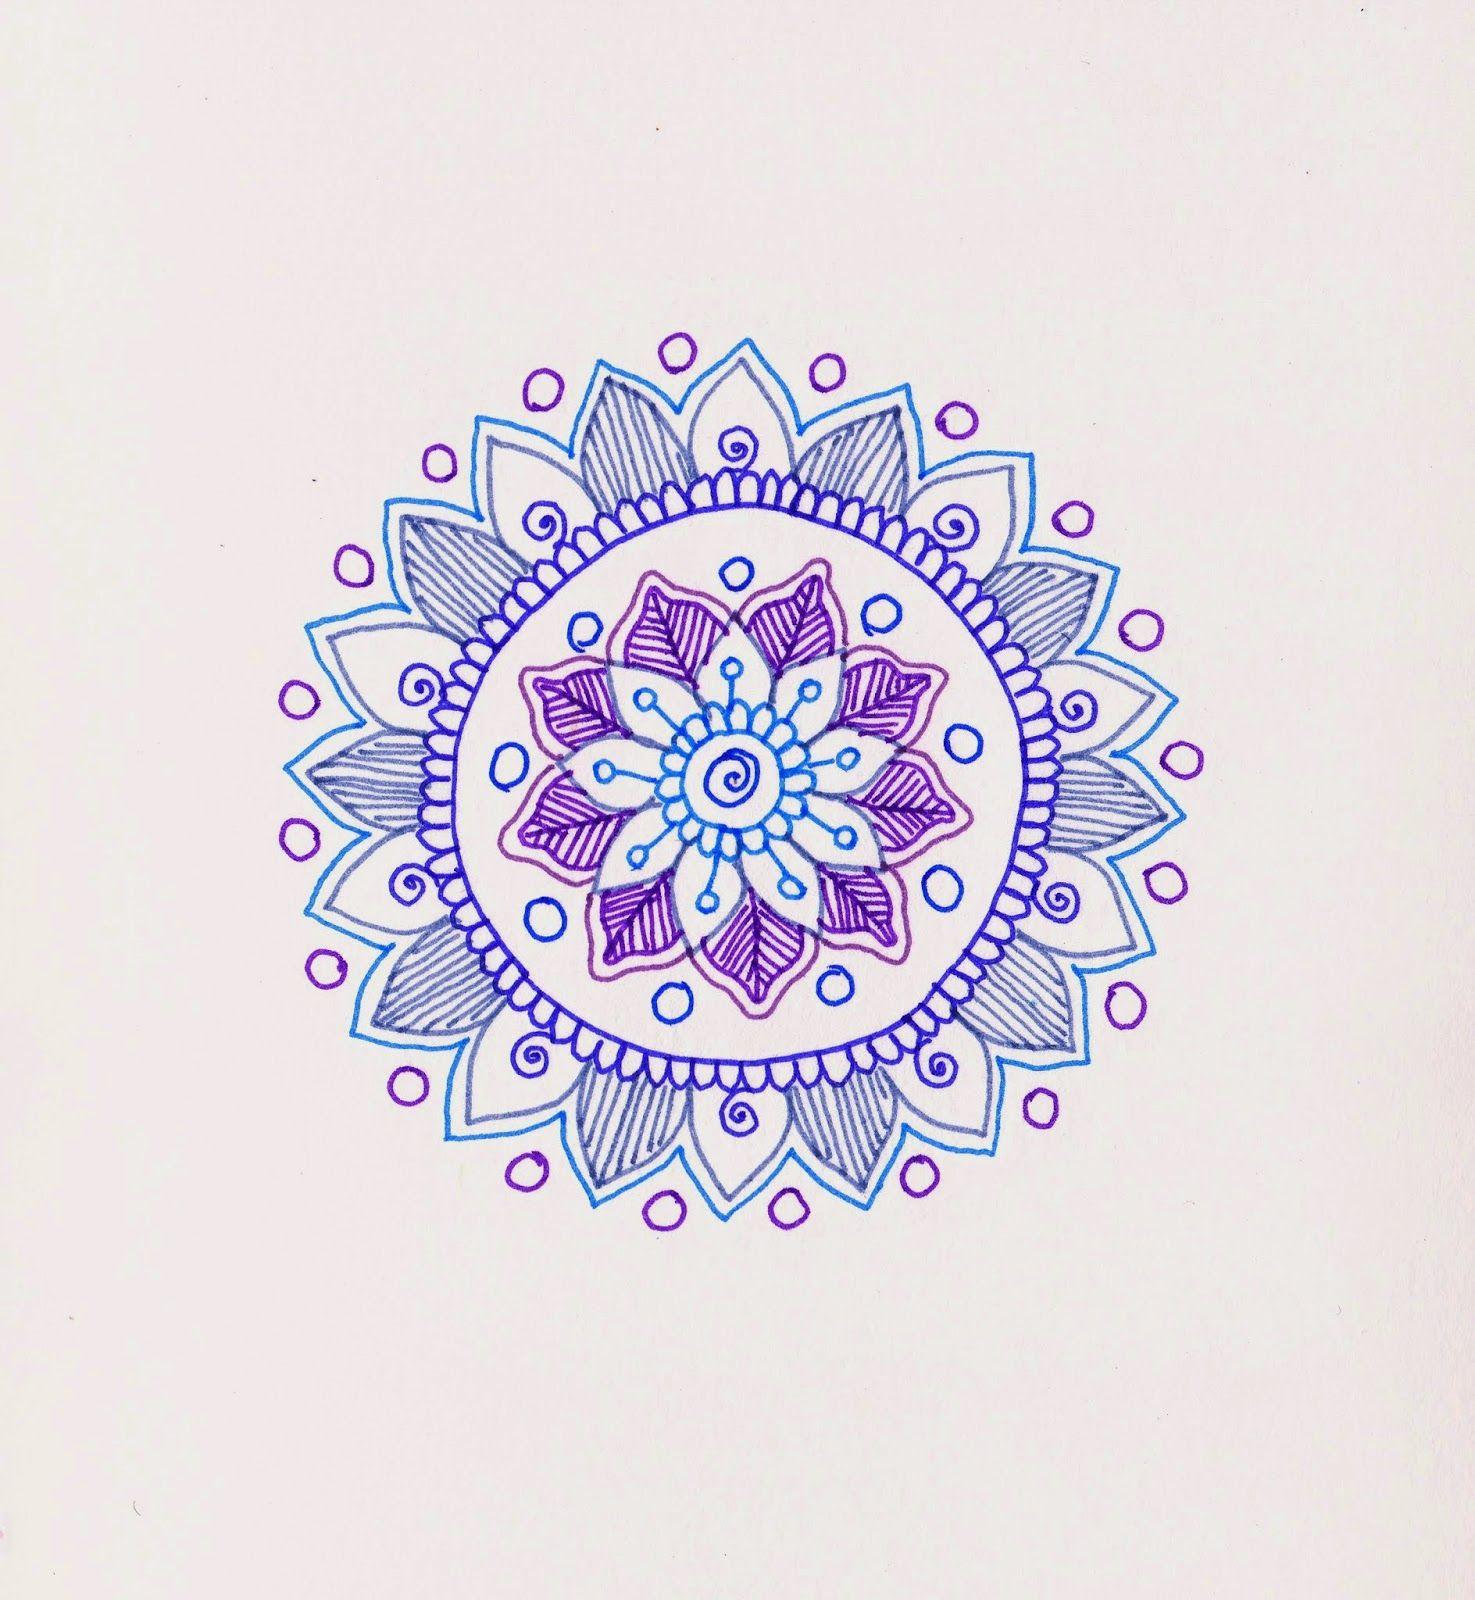 Step By Step Tutorial For Making Mandalas #mandala